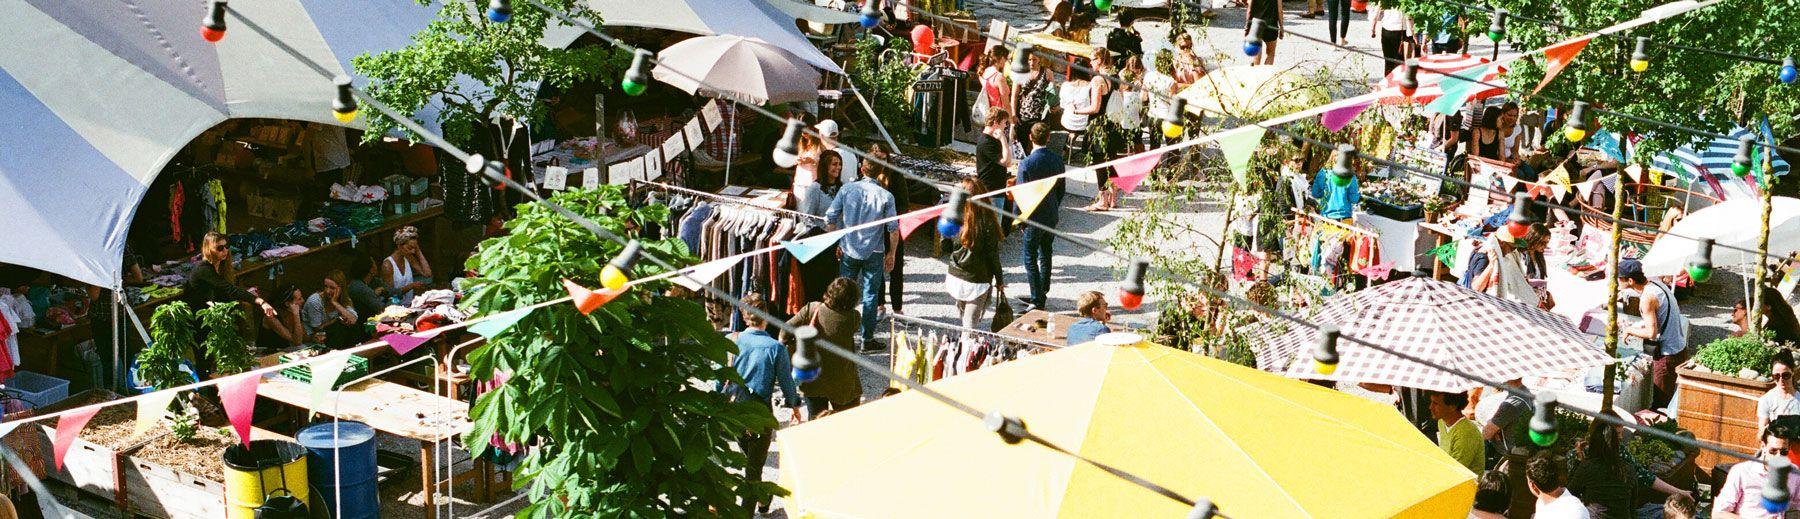 Markt bei Frau Gerold